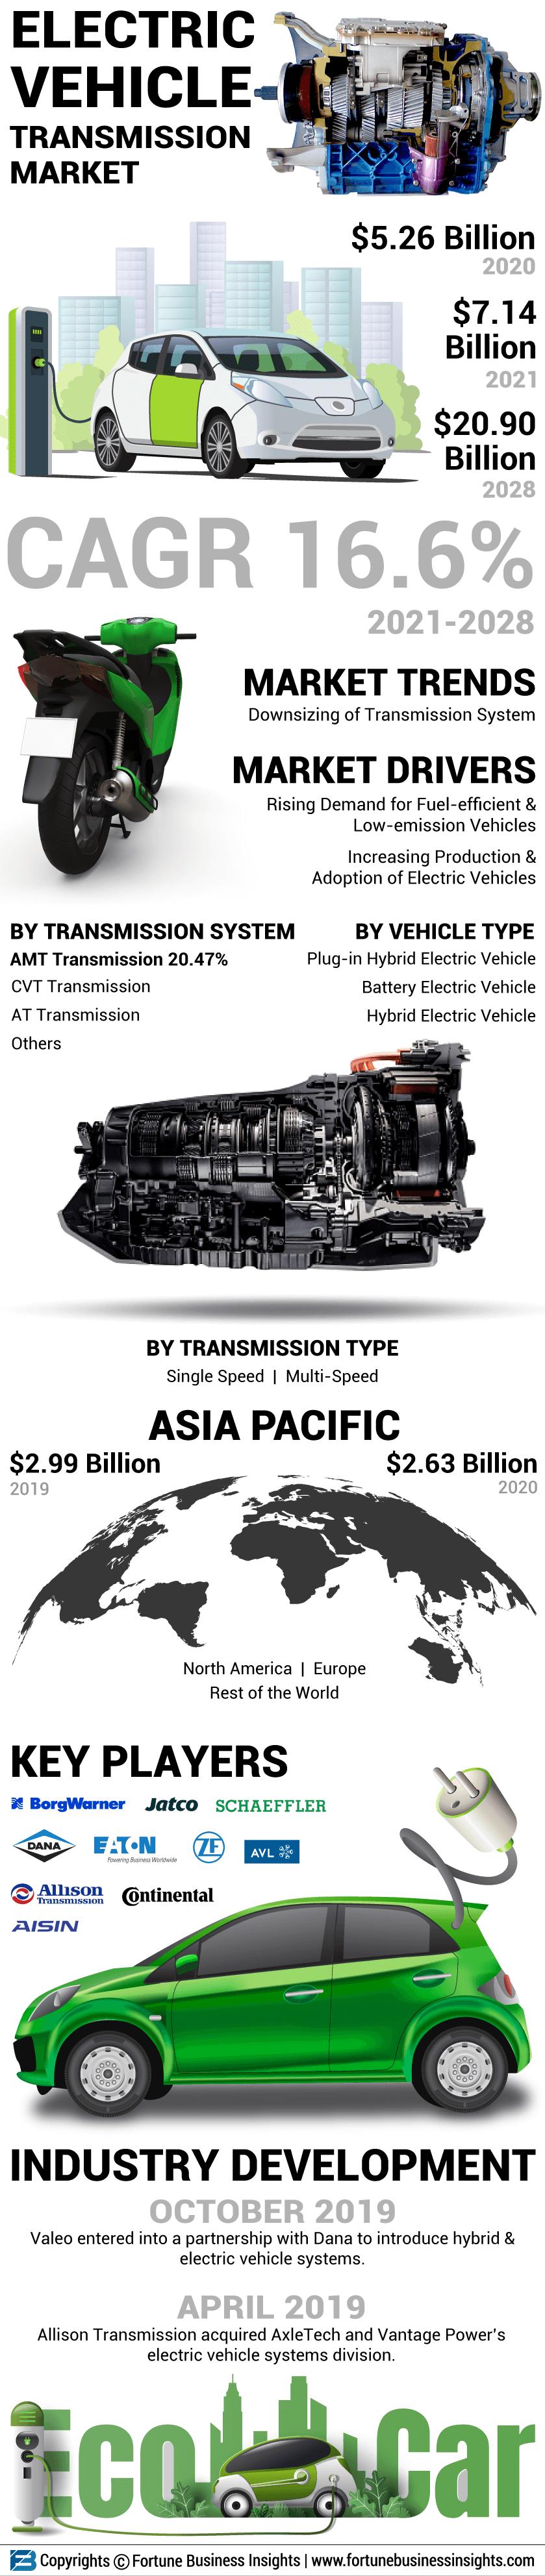 Electric Vehicle Transmission Market